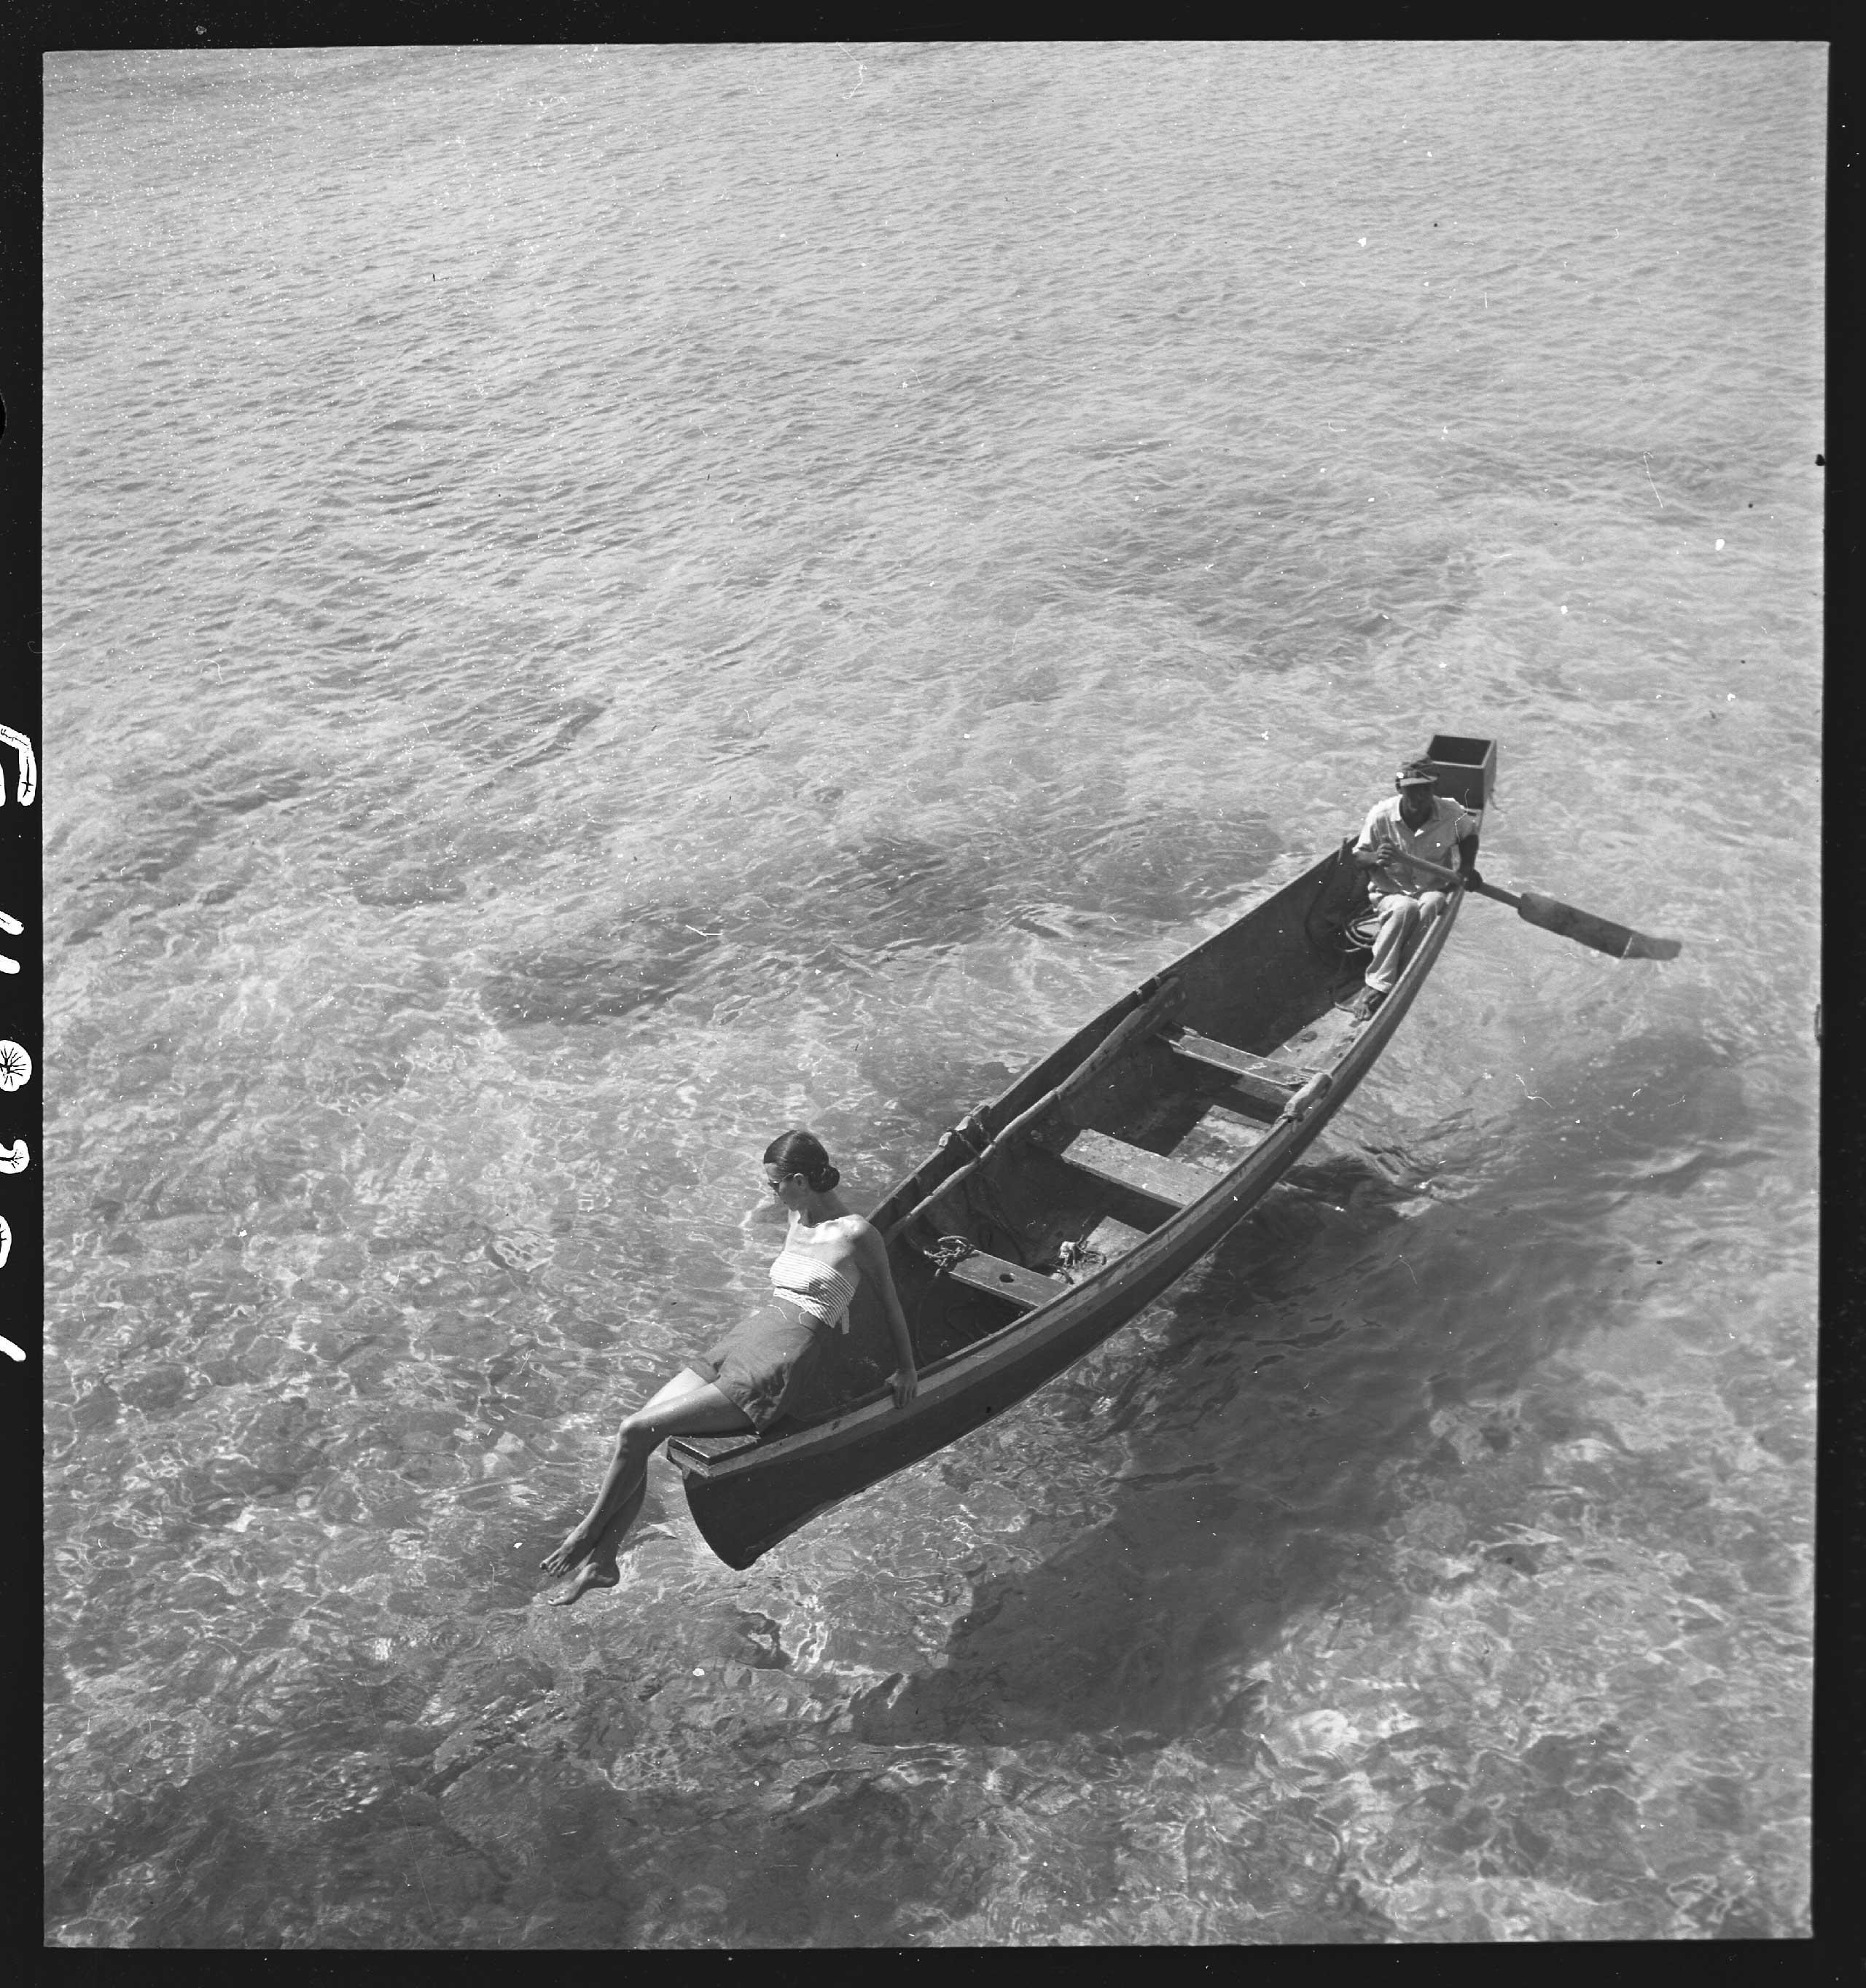 Fashion model on edge of boat, man rowing, Montego Bay, Jamaica. published in Harper's Bazaar, Nov. 1946.